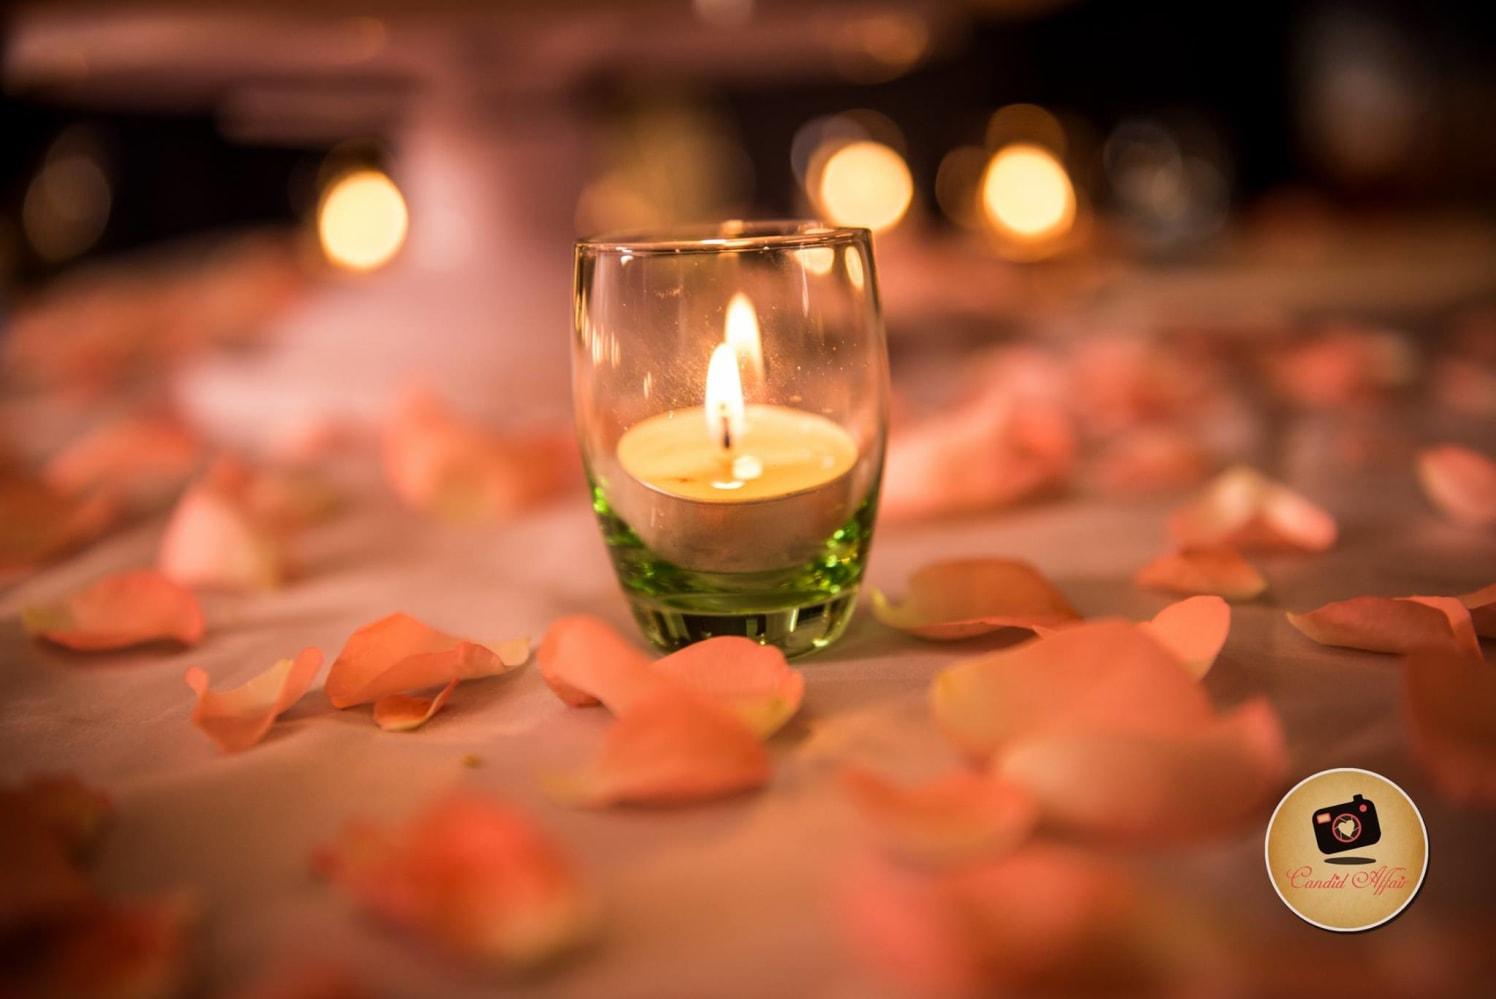 Simple Candle Decor For The Wedding Day by Candid Affair Wedding-decor | Weddings Photos & Ideas